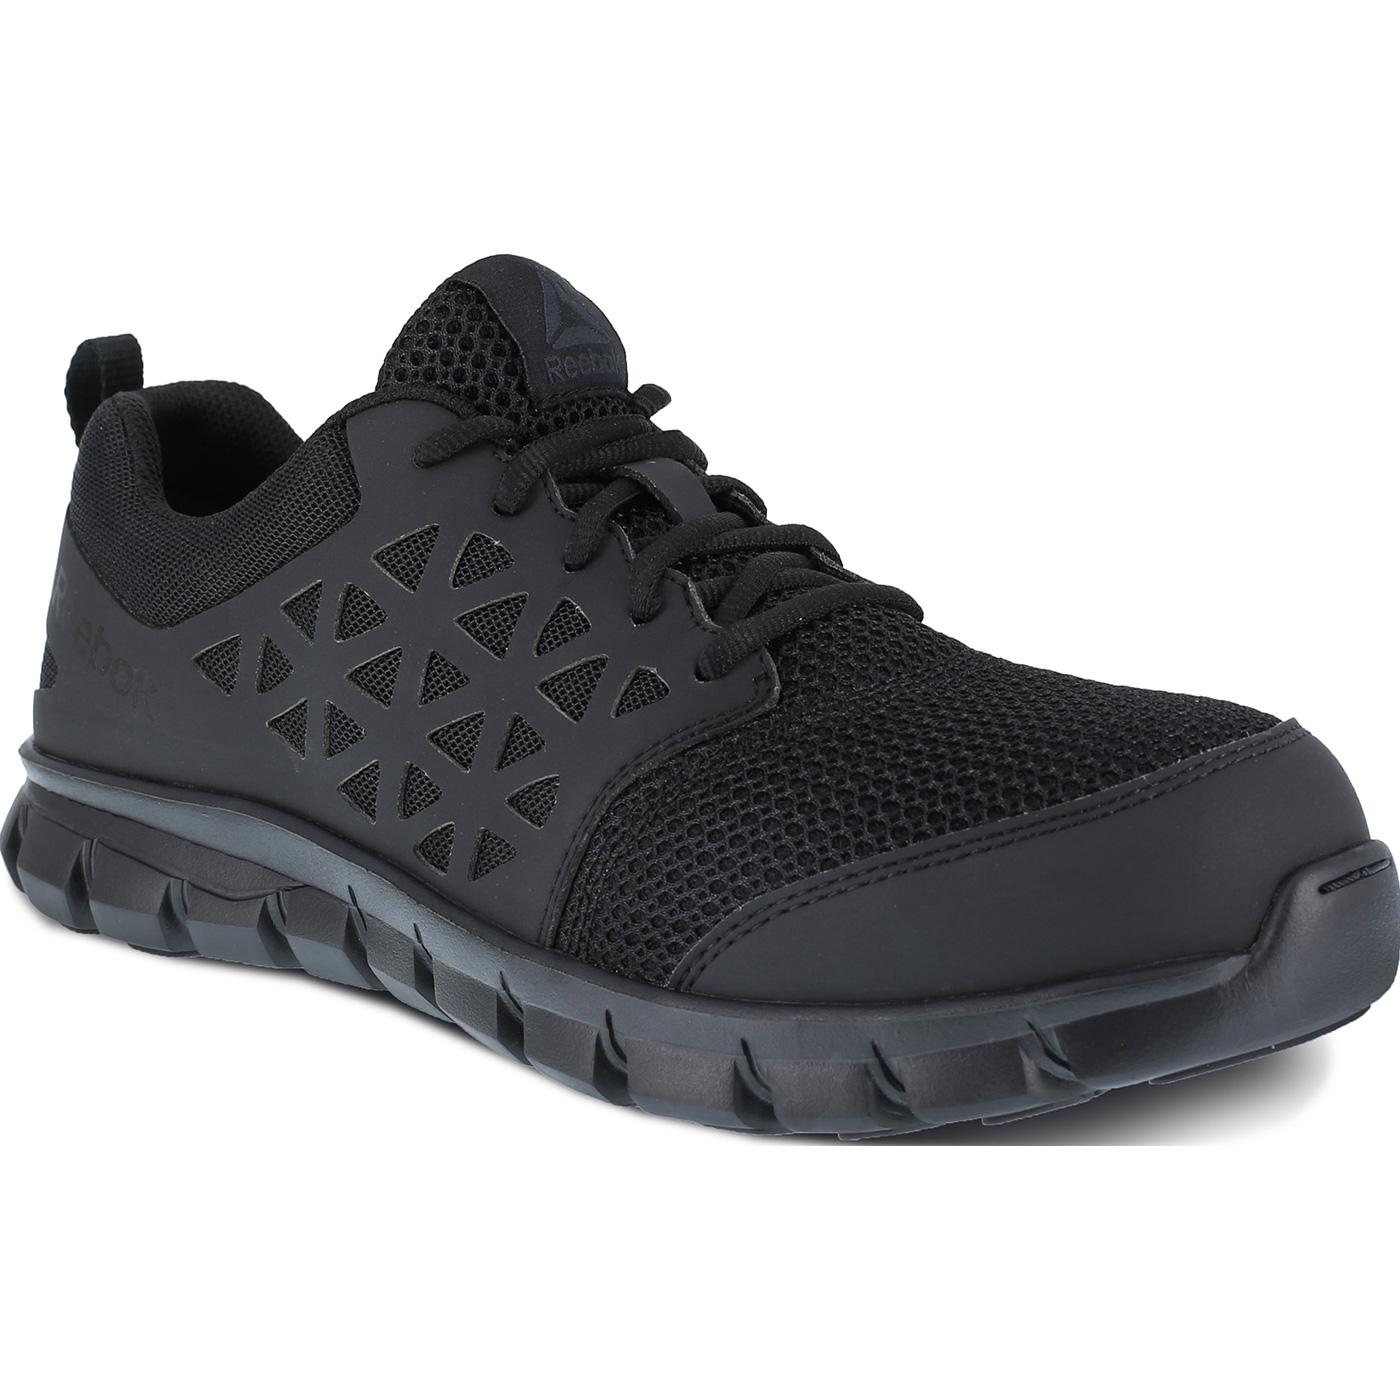 1176a8bdd6223 Reebok Sublite Cushion Work Men's Composite Toe Static-Dissipative  Slip-Resistant Work Athletic Shoe